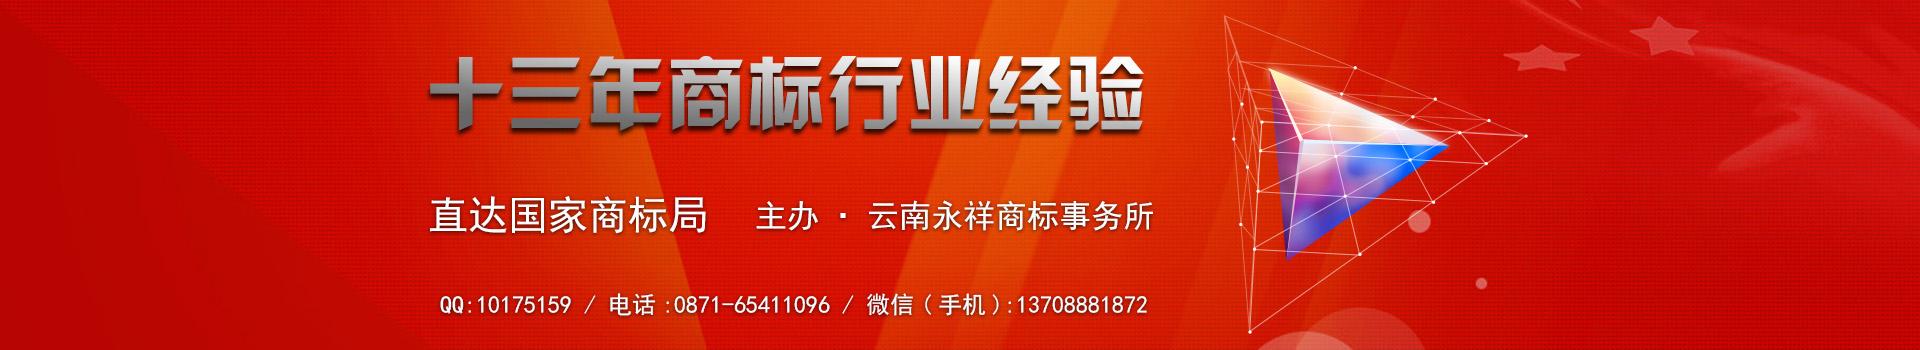 cctv5世界杯直播平台注册代理公司